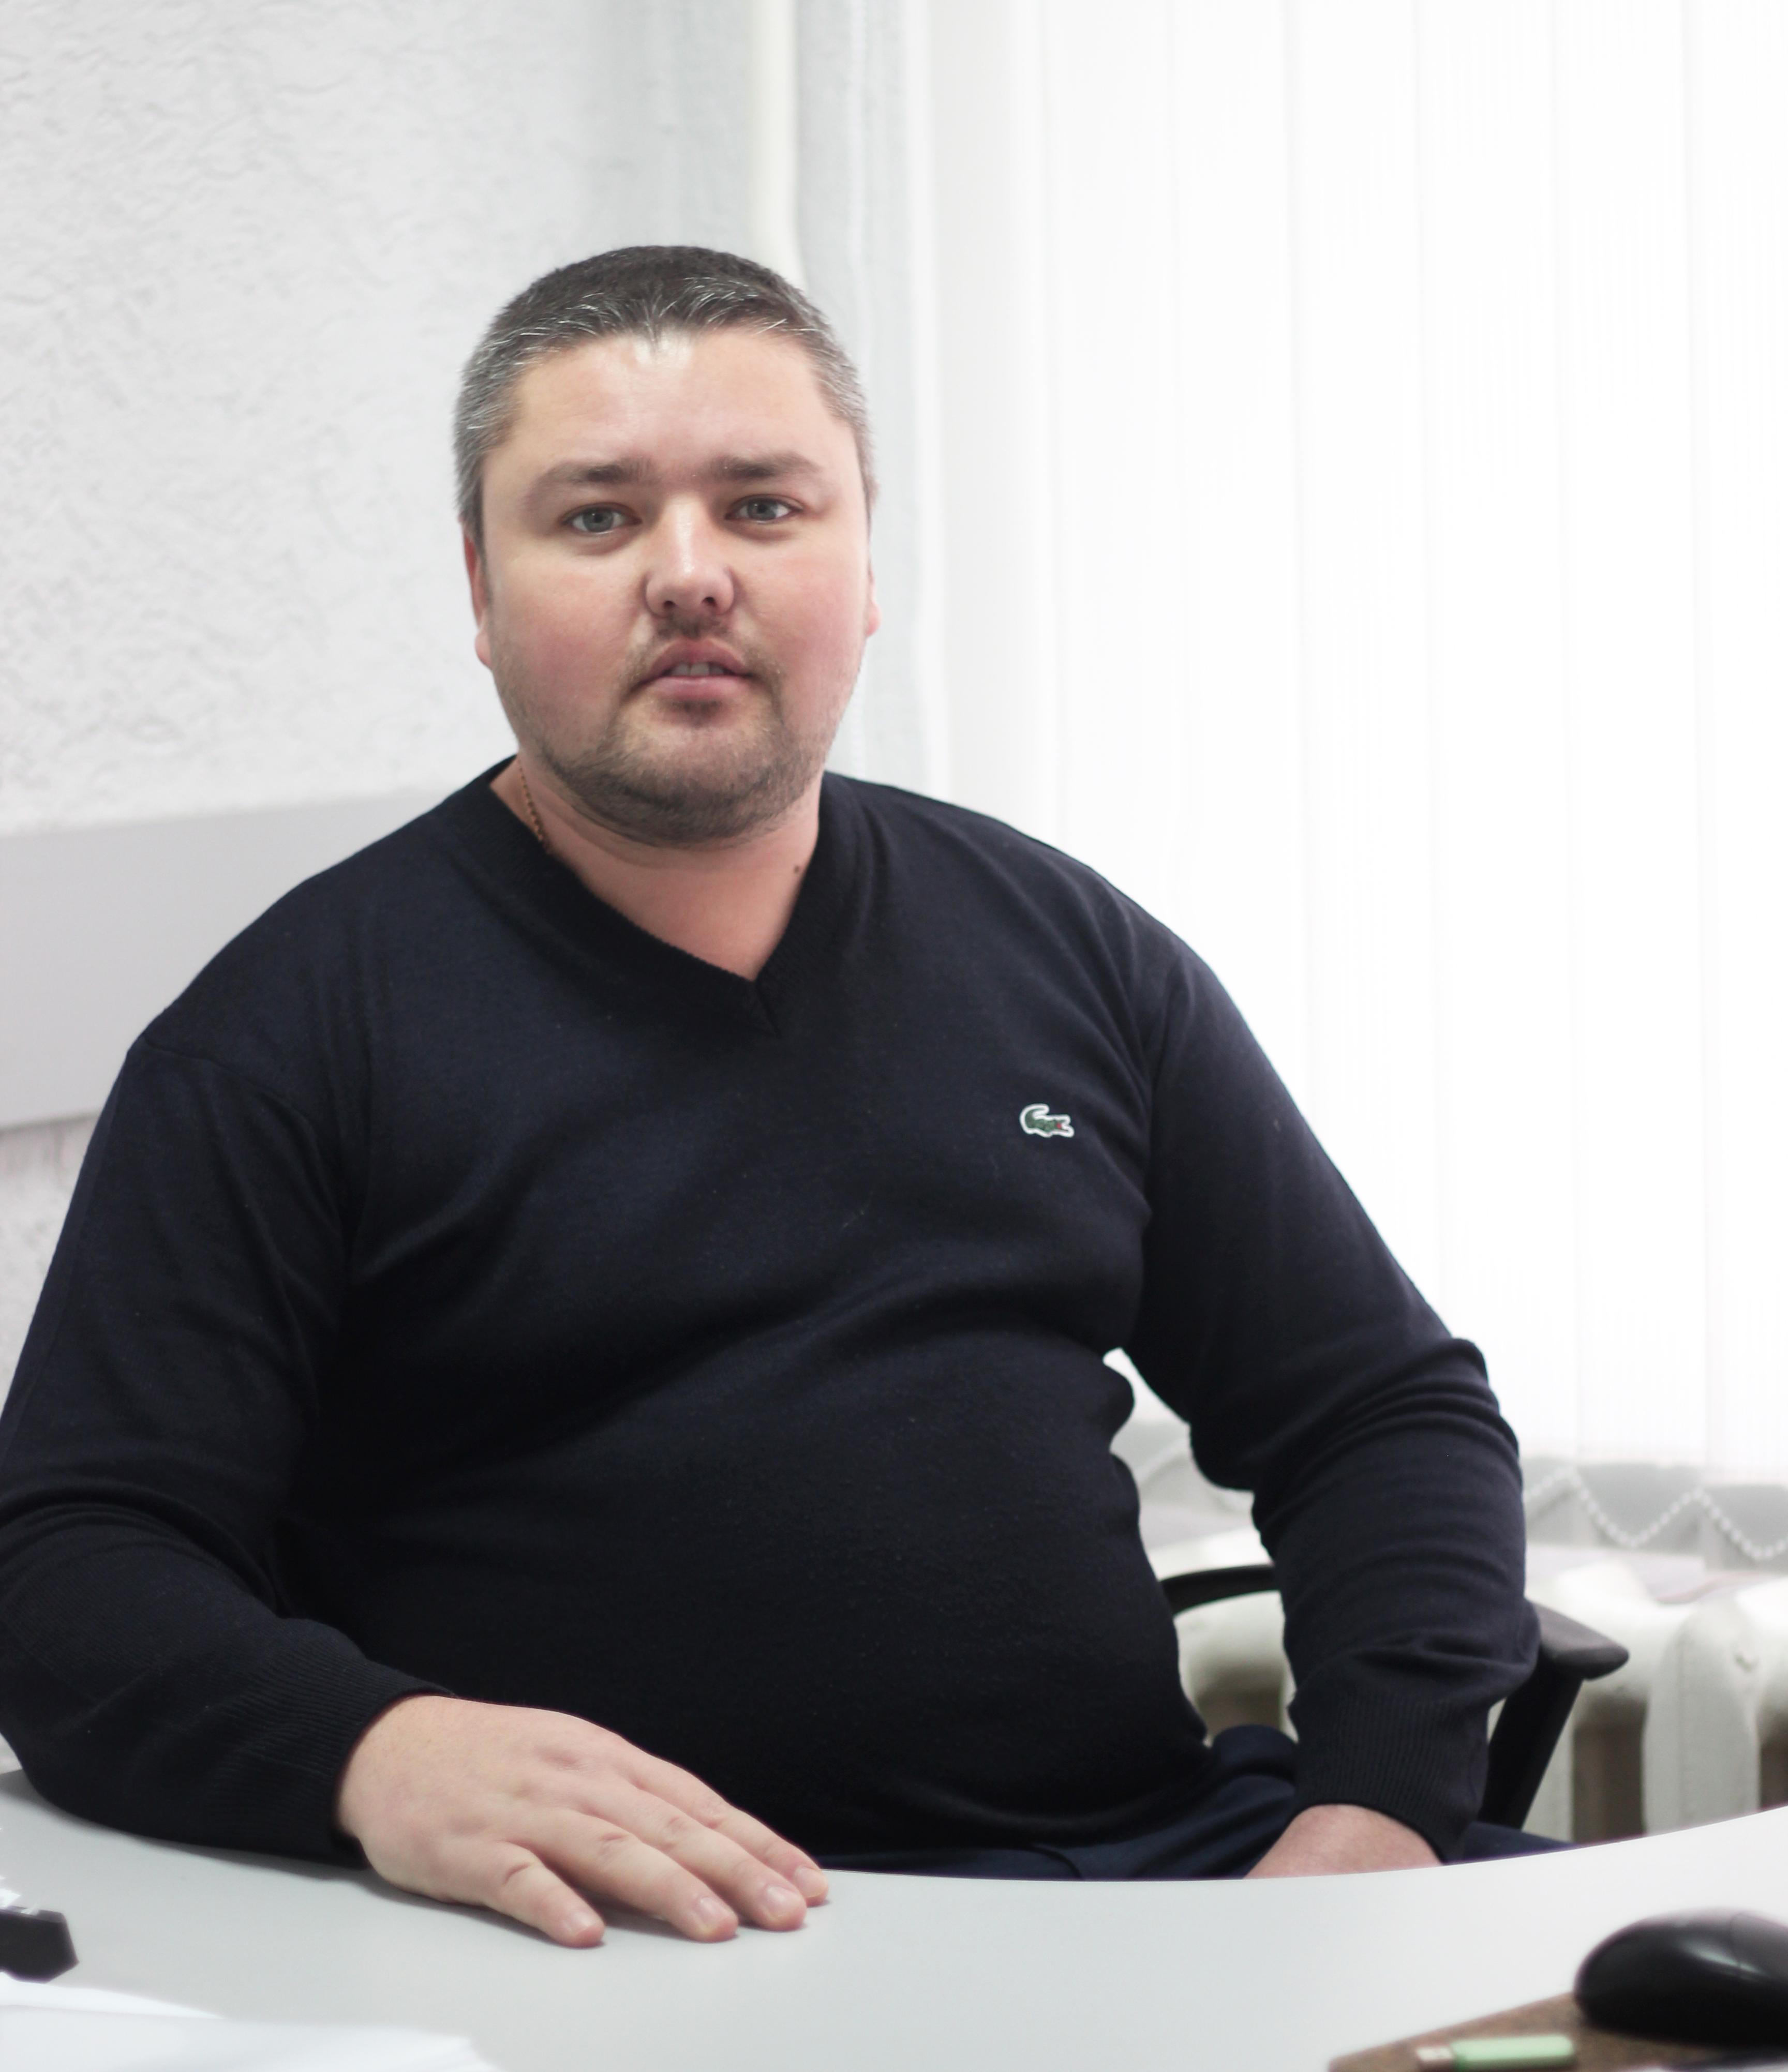 Специалист по безопасности ГАЗИЕВ Эдем Ризаевич